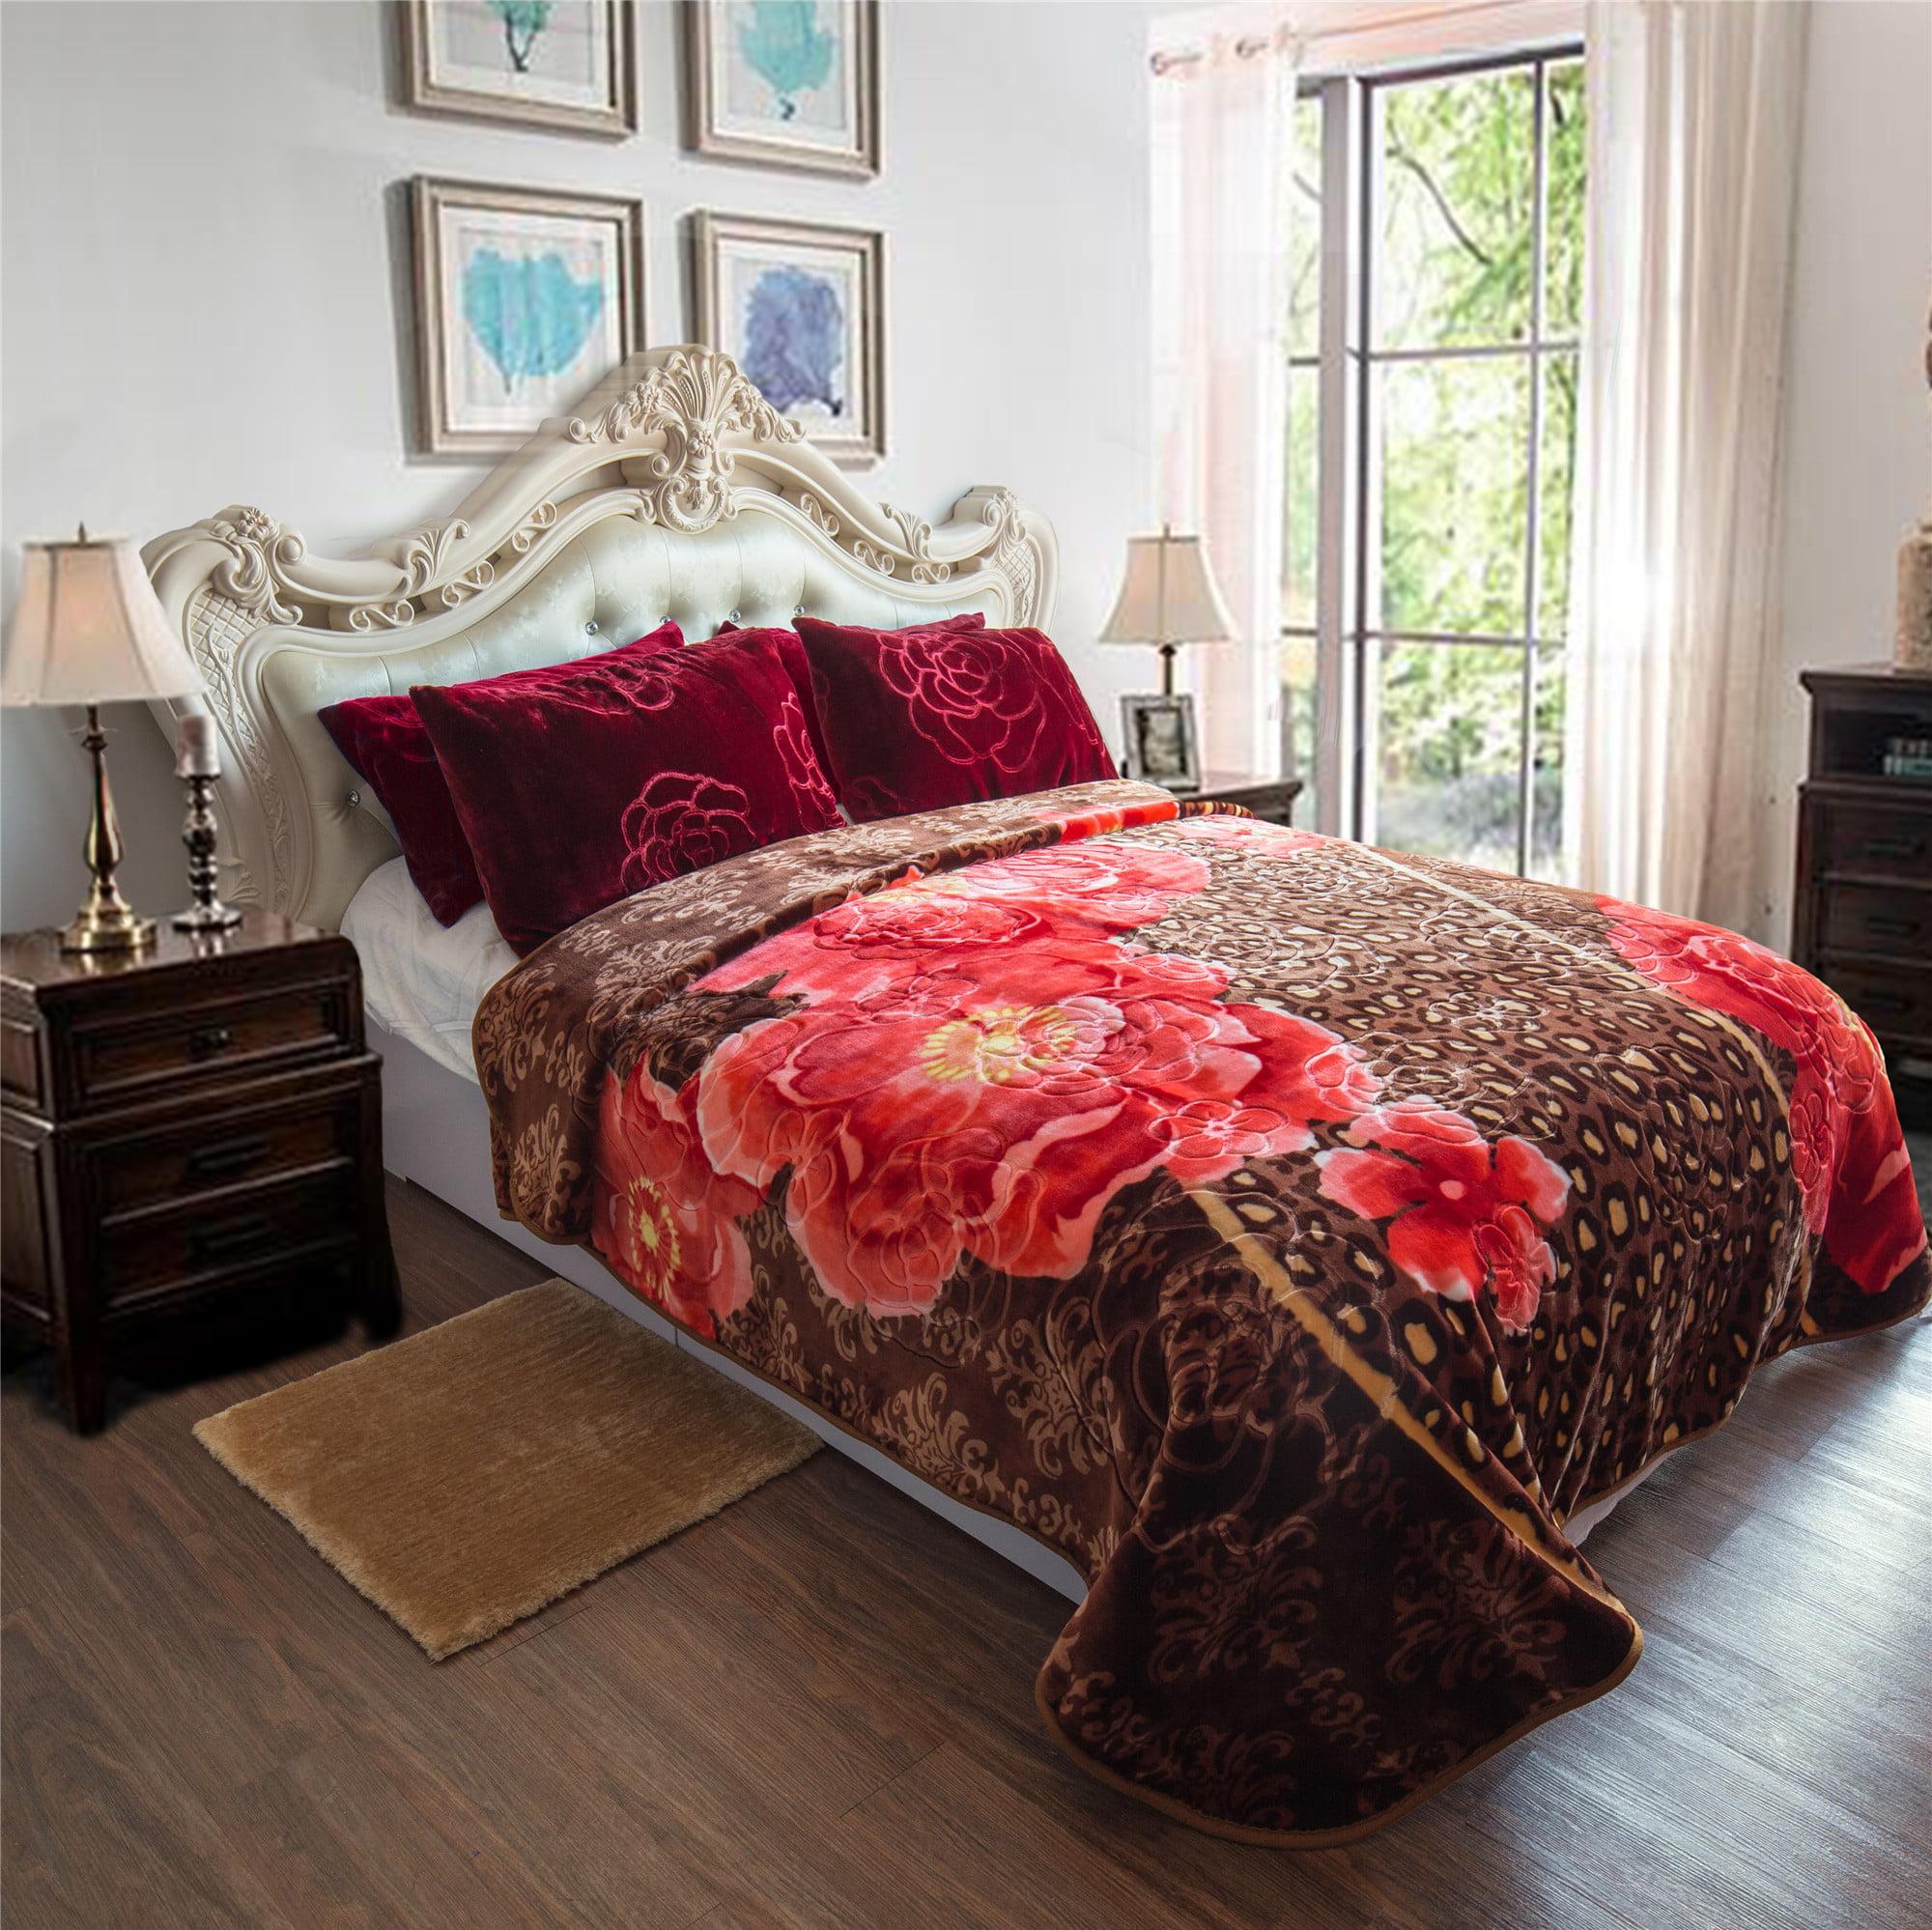 All Seasons Heavy Thick Super Cozy Plush Mink Blanket Winter Warm Soft Fleece Blanket For... by JML